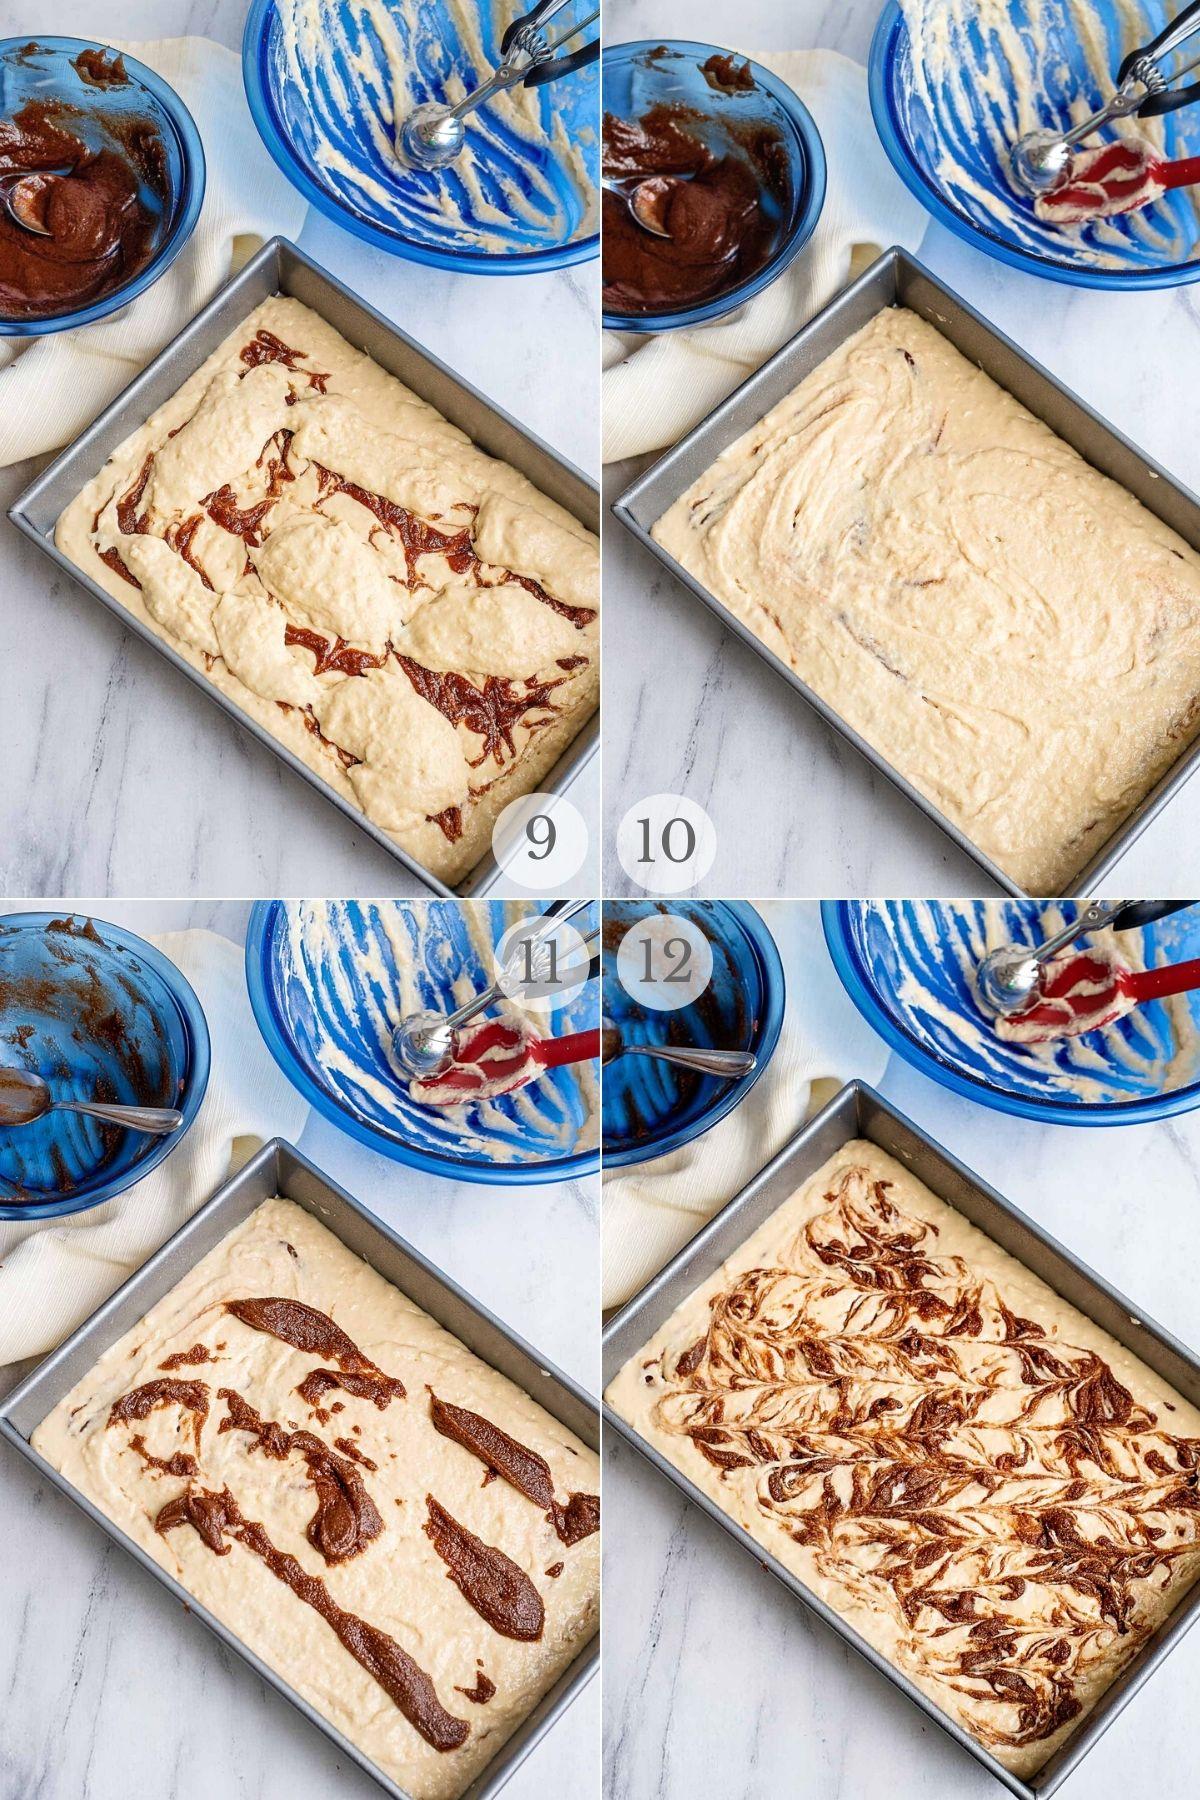 cinnamon roll cake recipe steps 9-12